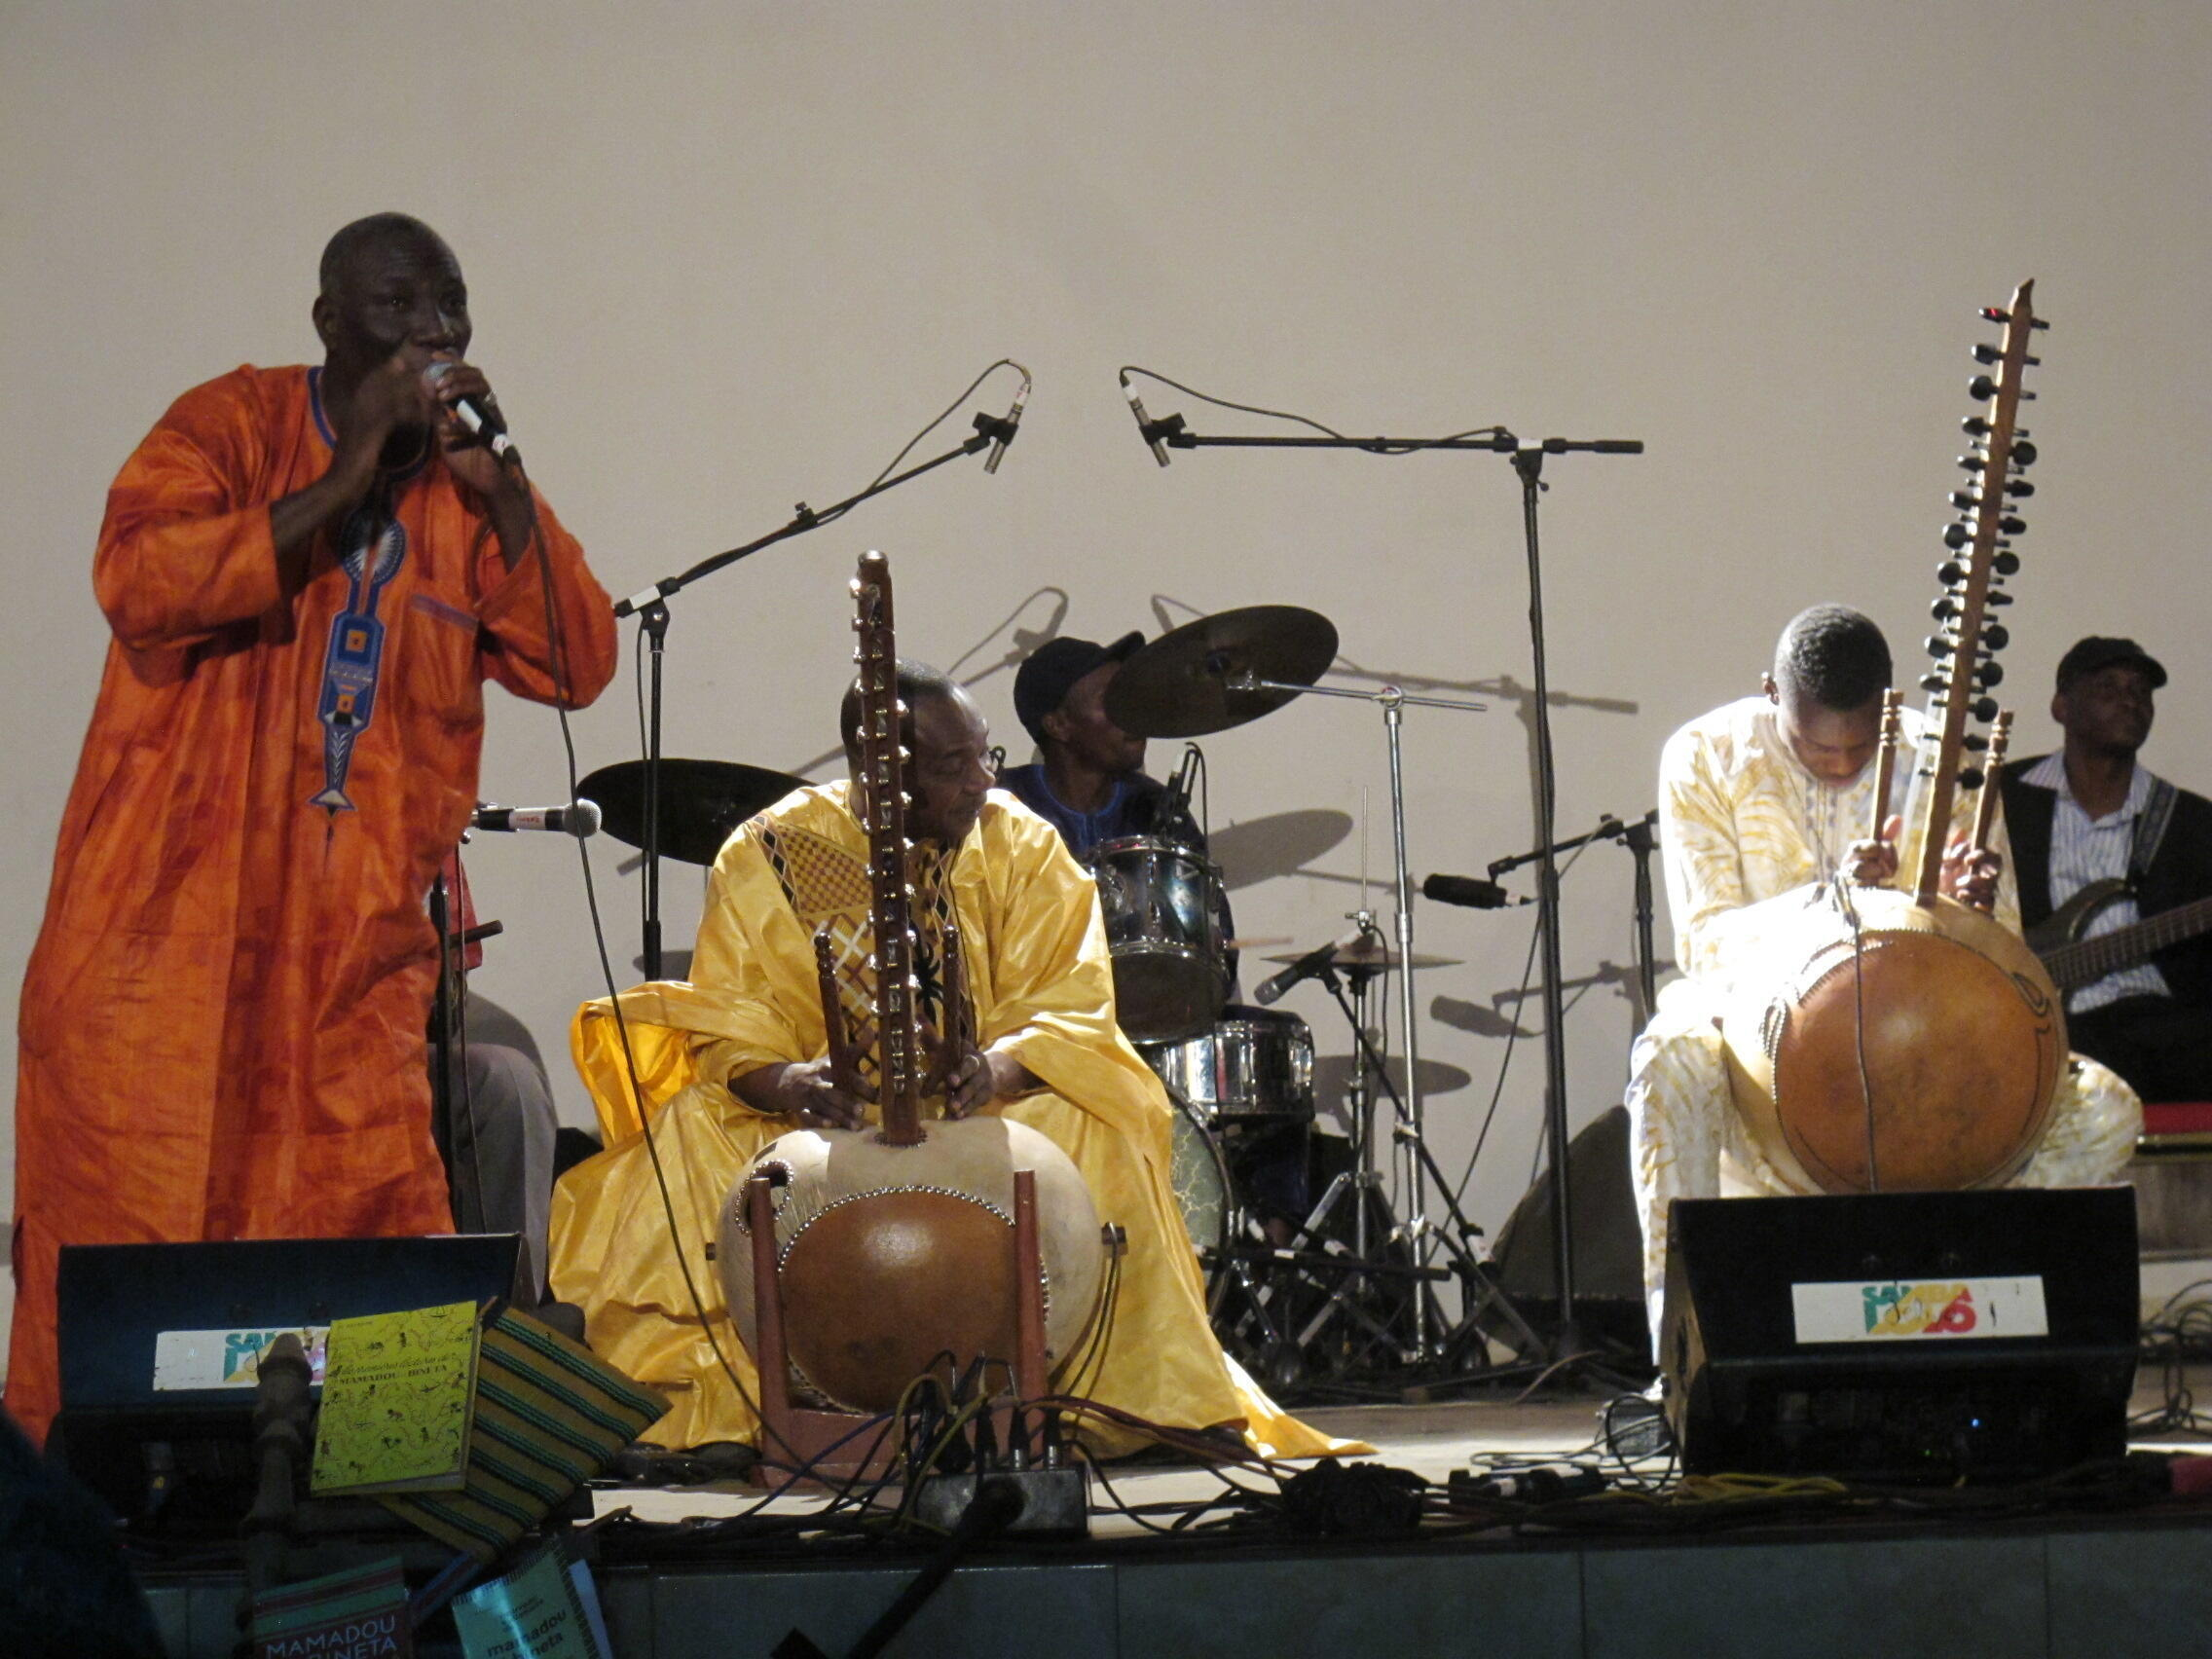 Toumani Diabaté, seu filho Sidiki e seu grupo Symmetric Orchestra no festival Akoustik Bamako